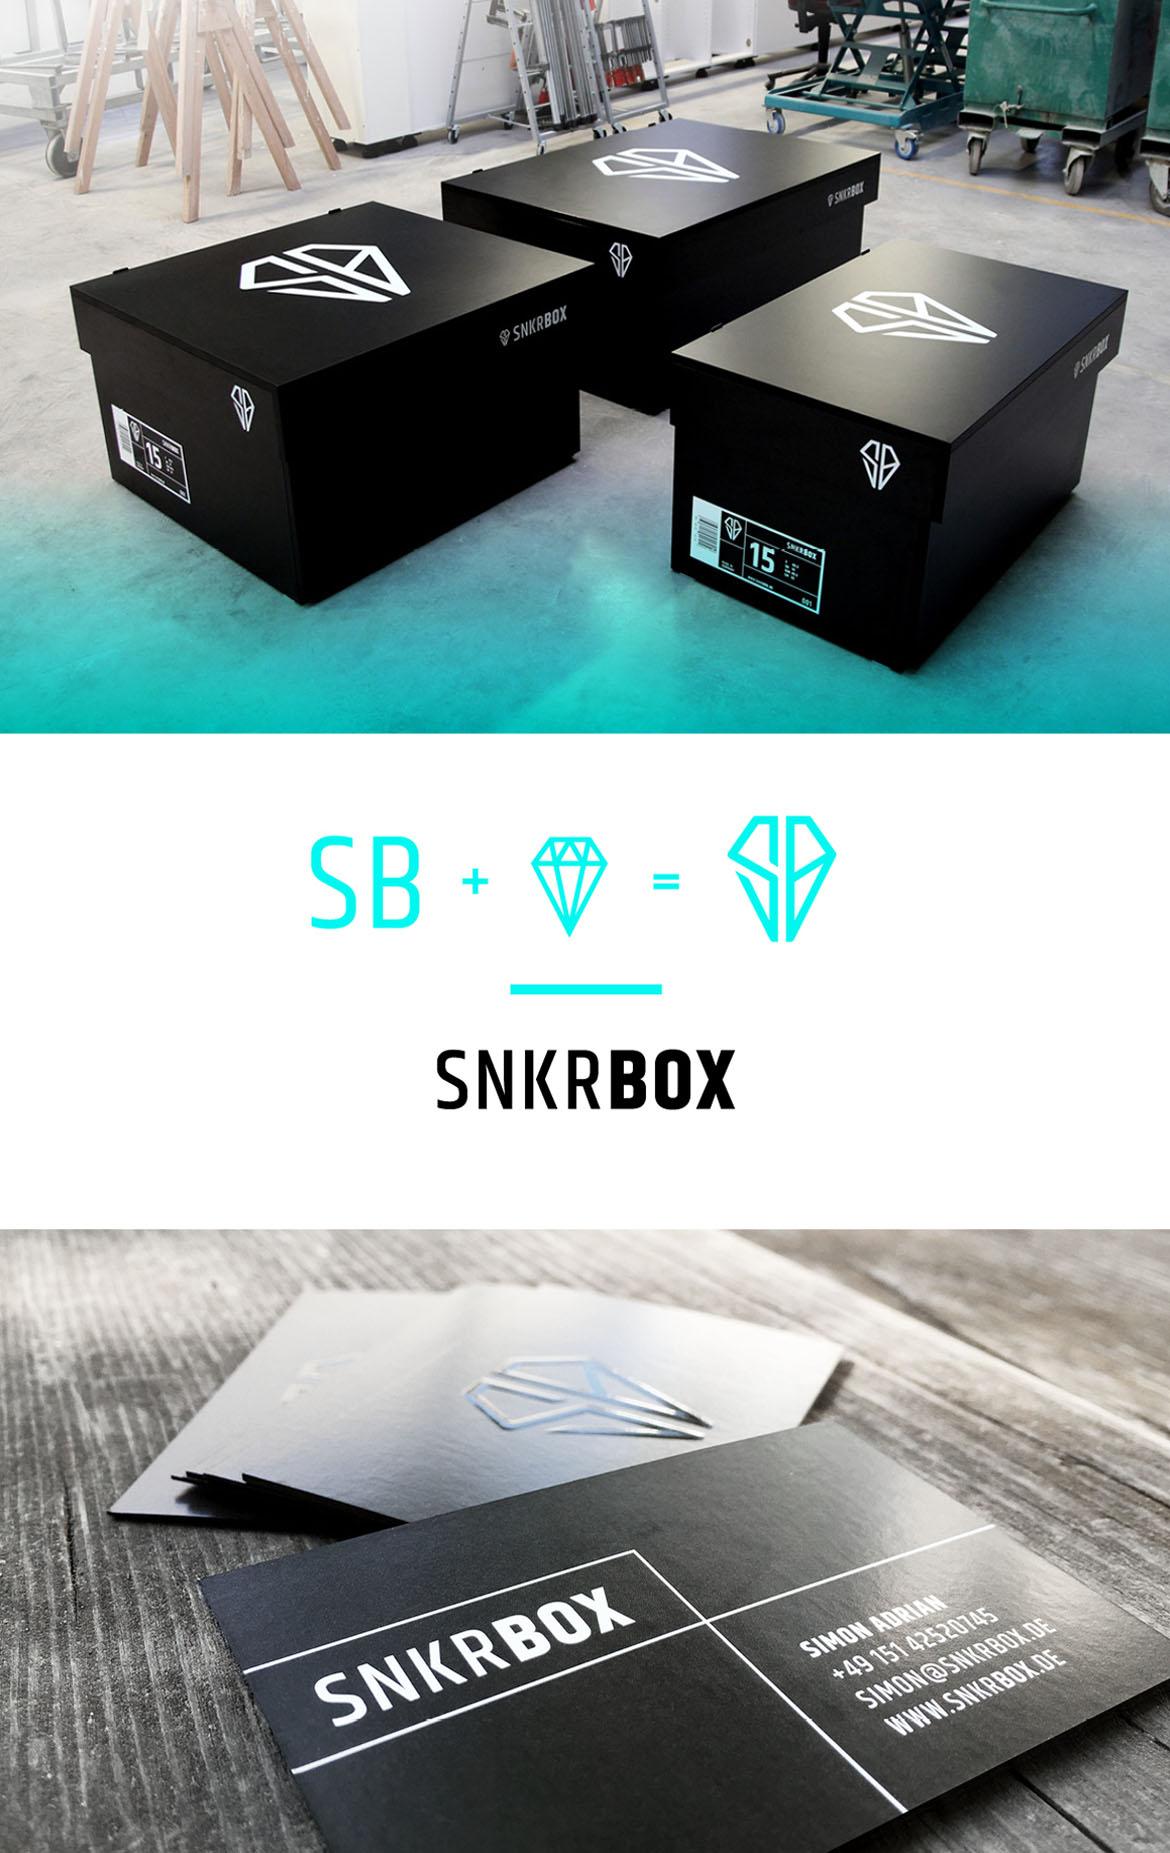 Snkrbox_01